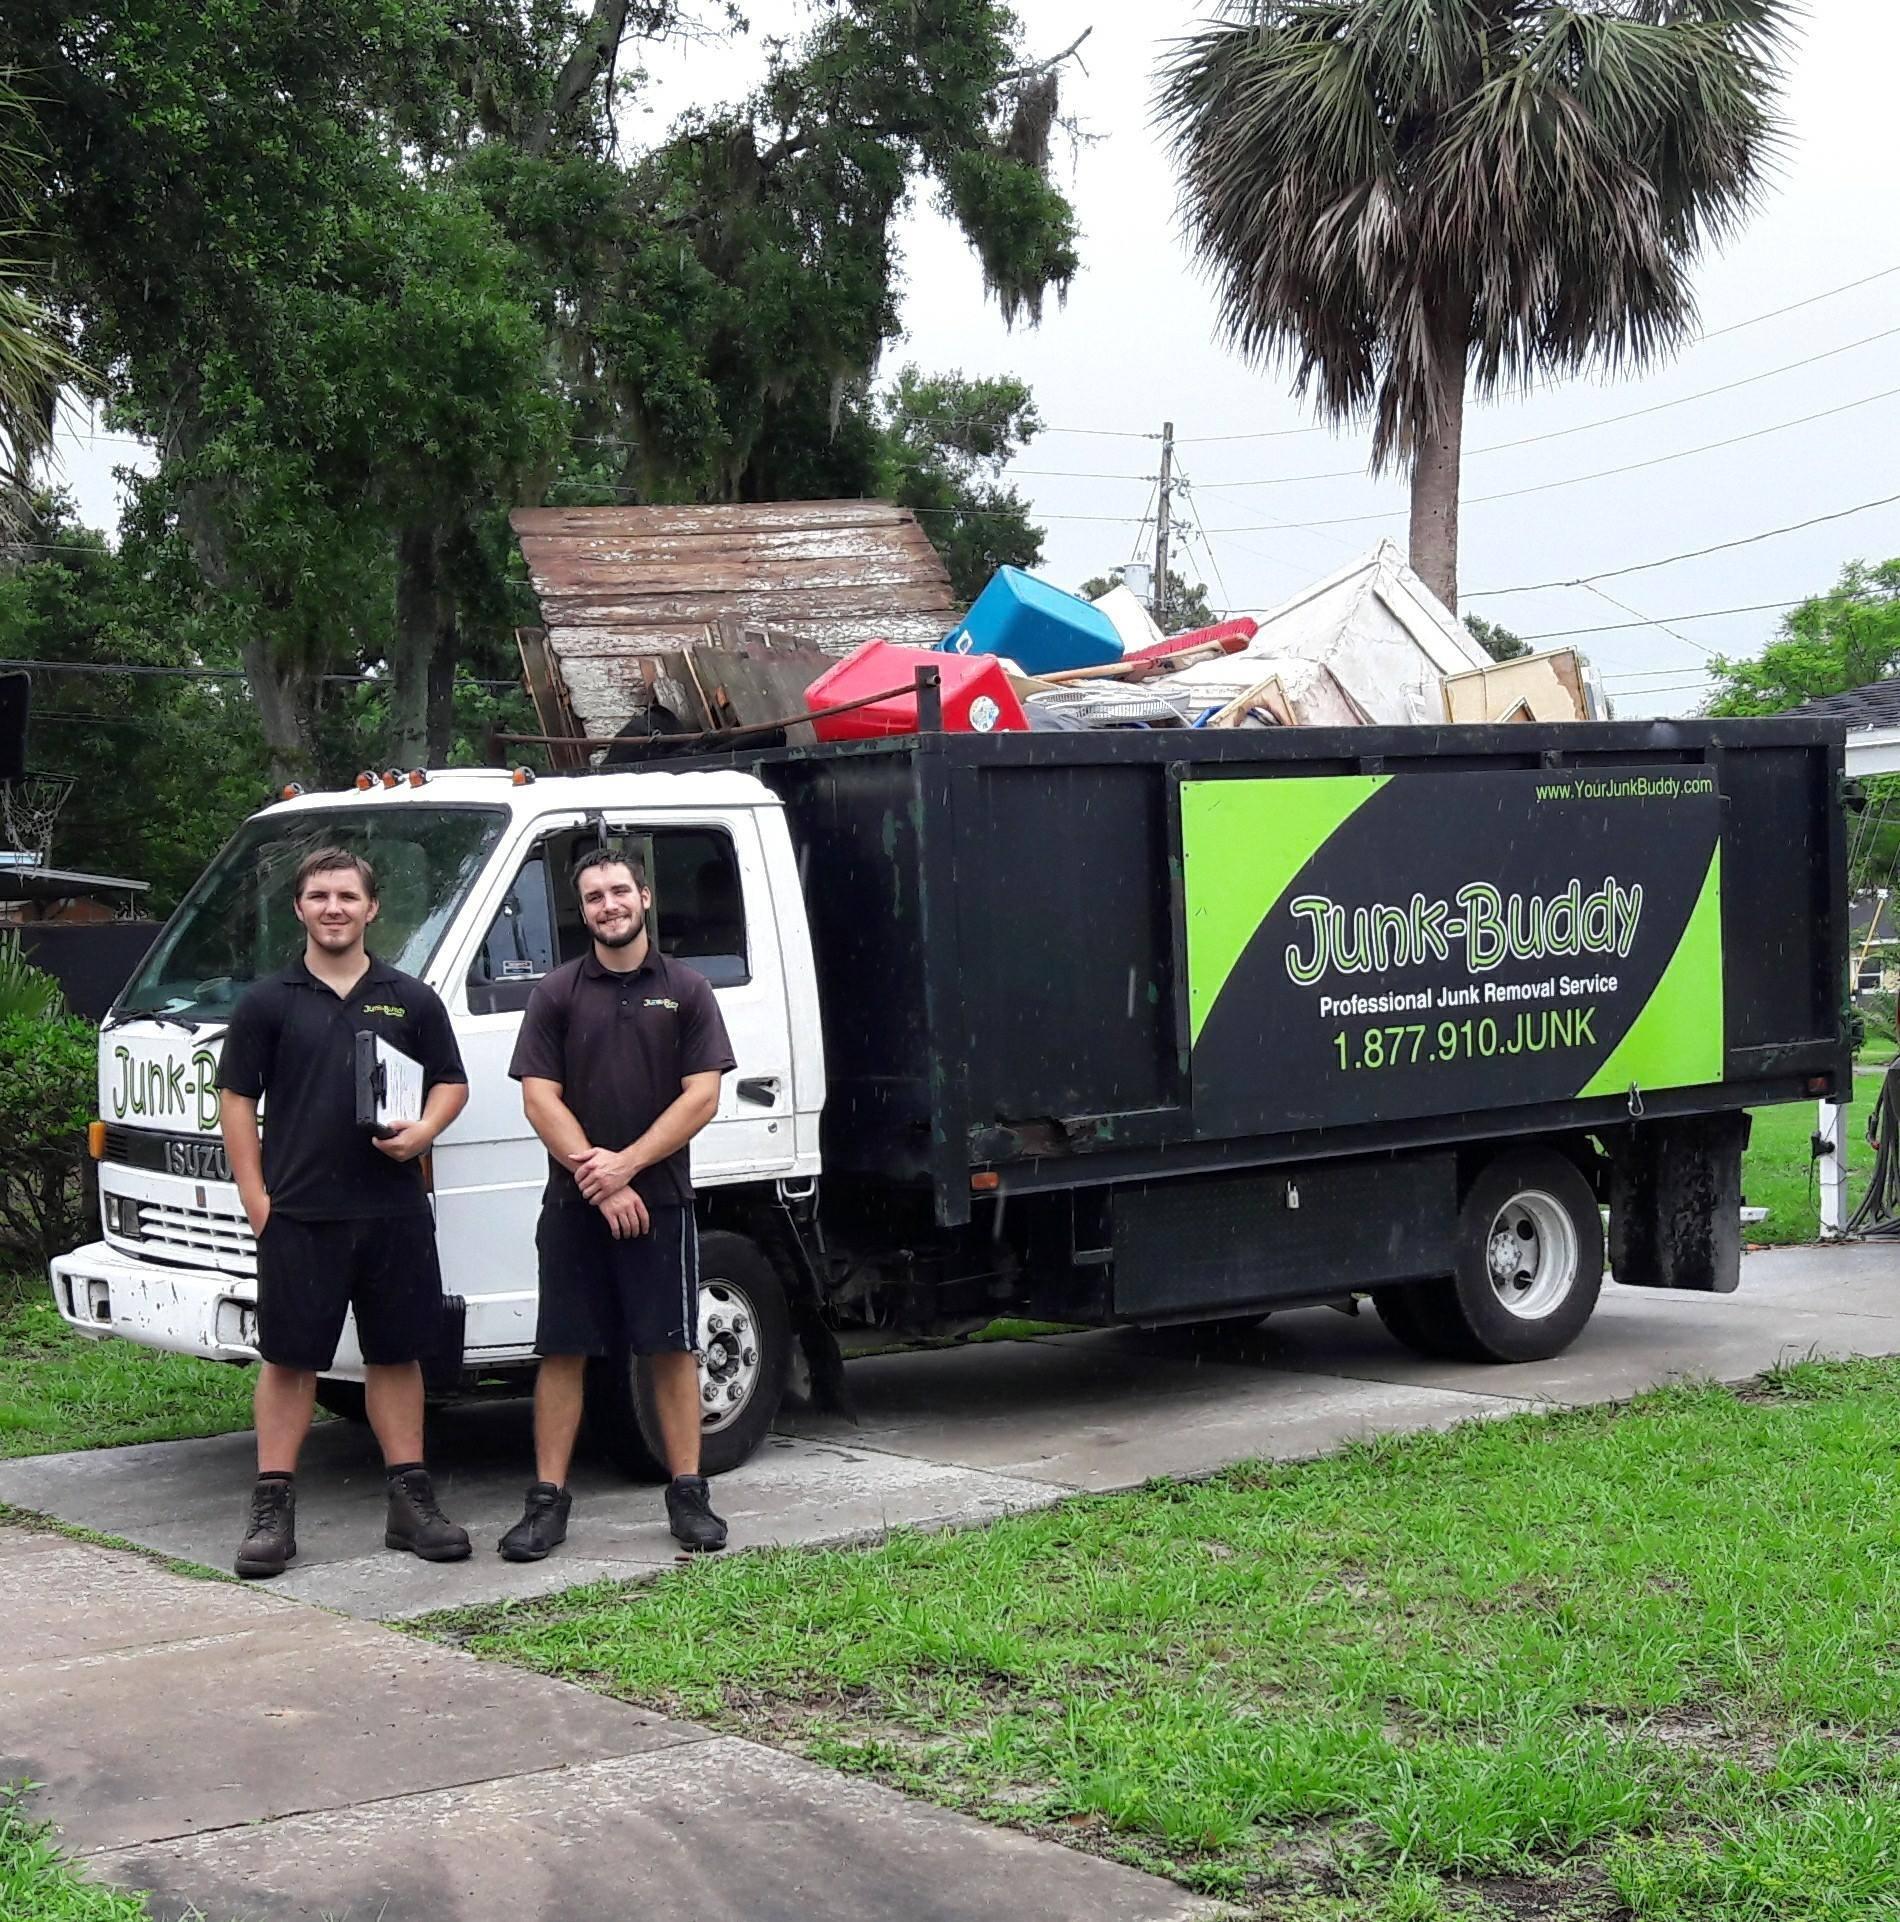 Trinity, Florida Junk Removal